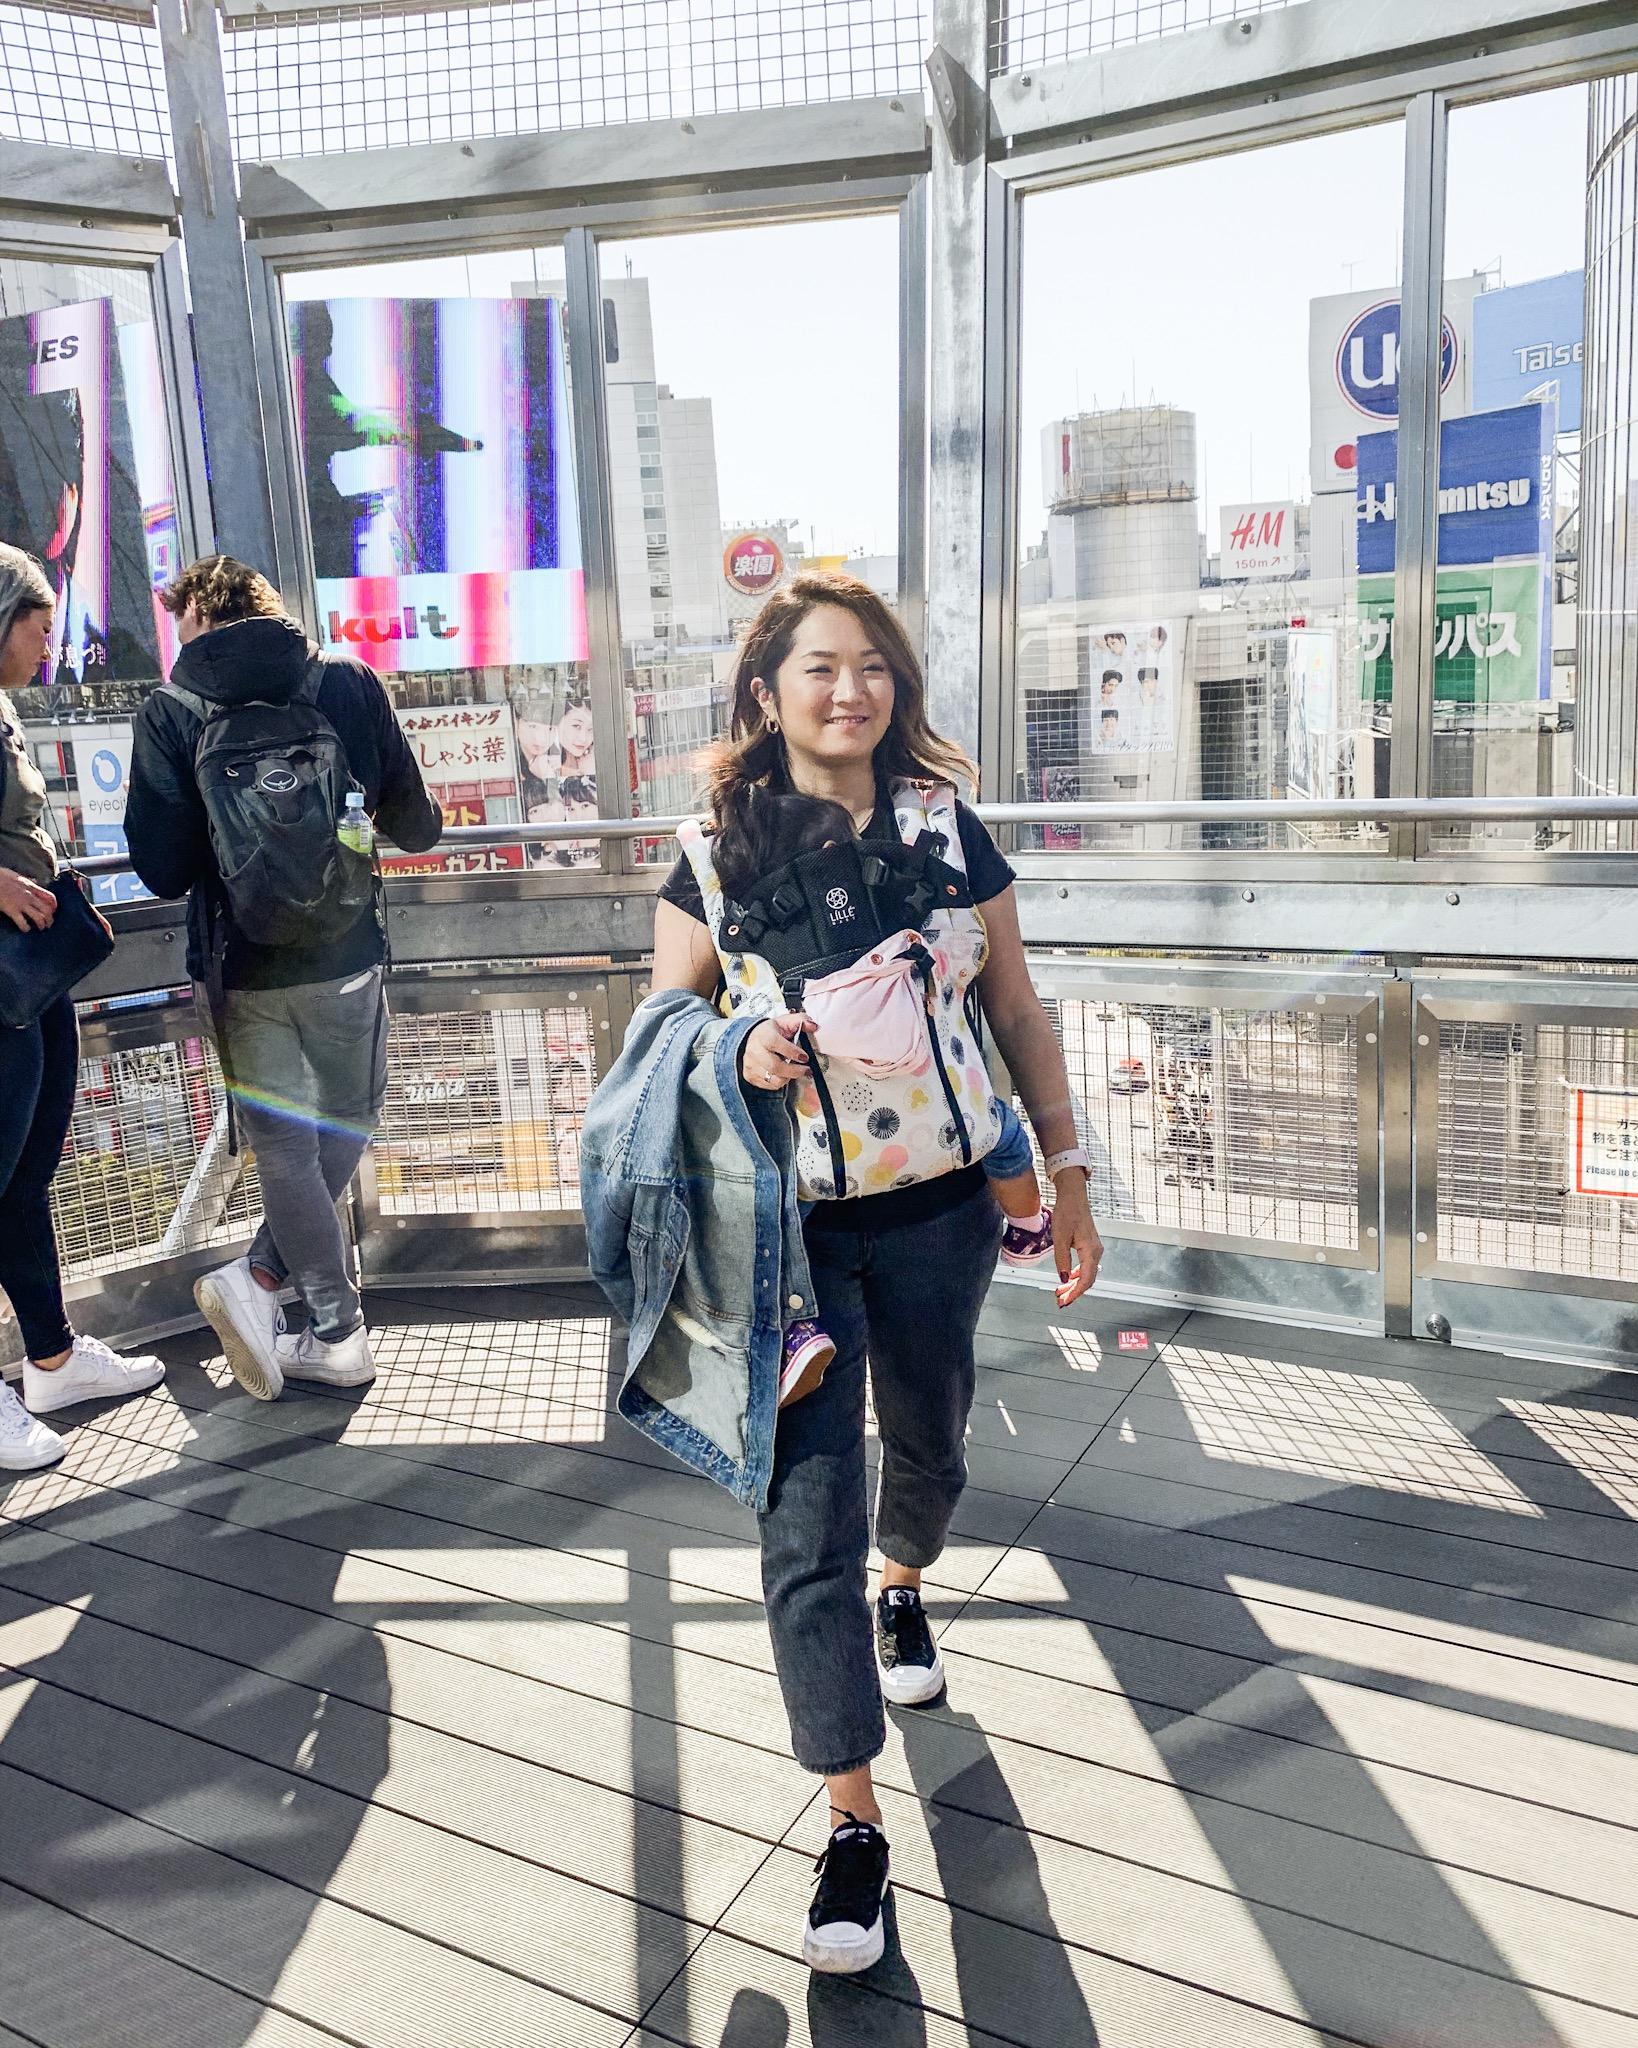 shibuya crossing with kids japan travel blog